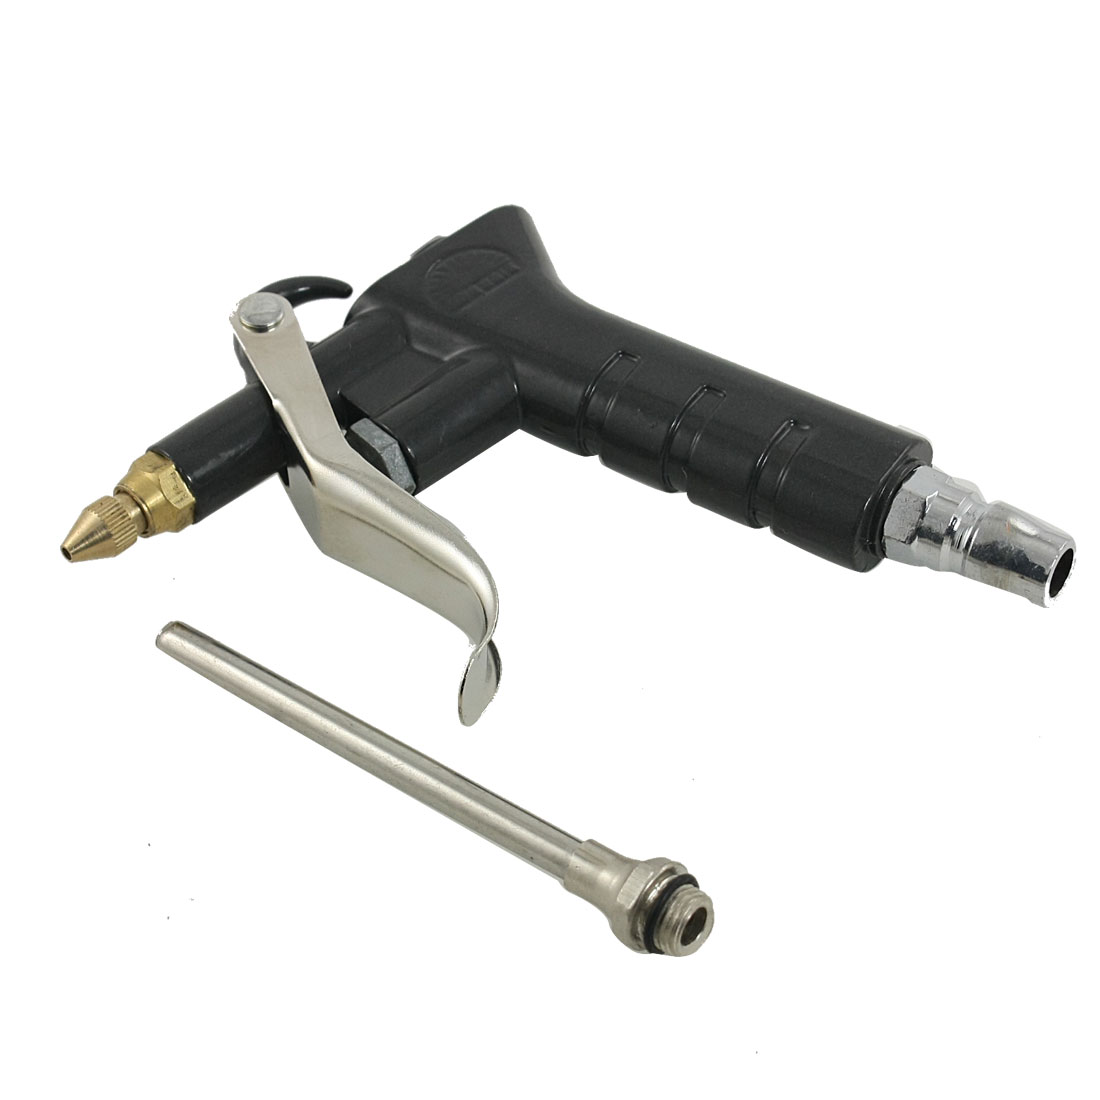 Black Metal Blowing Dust Cleaning Tool Trigger Air Duster Blower Gun